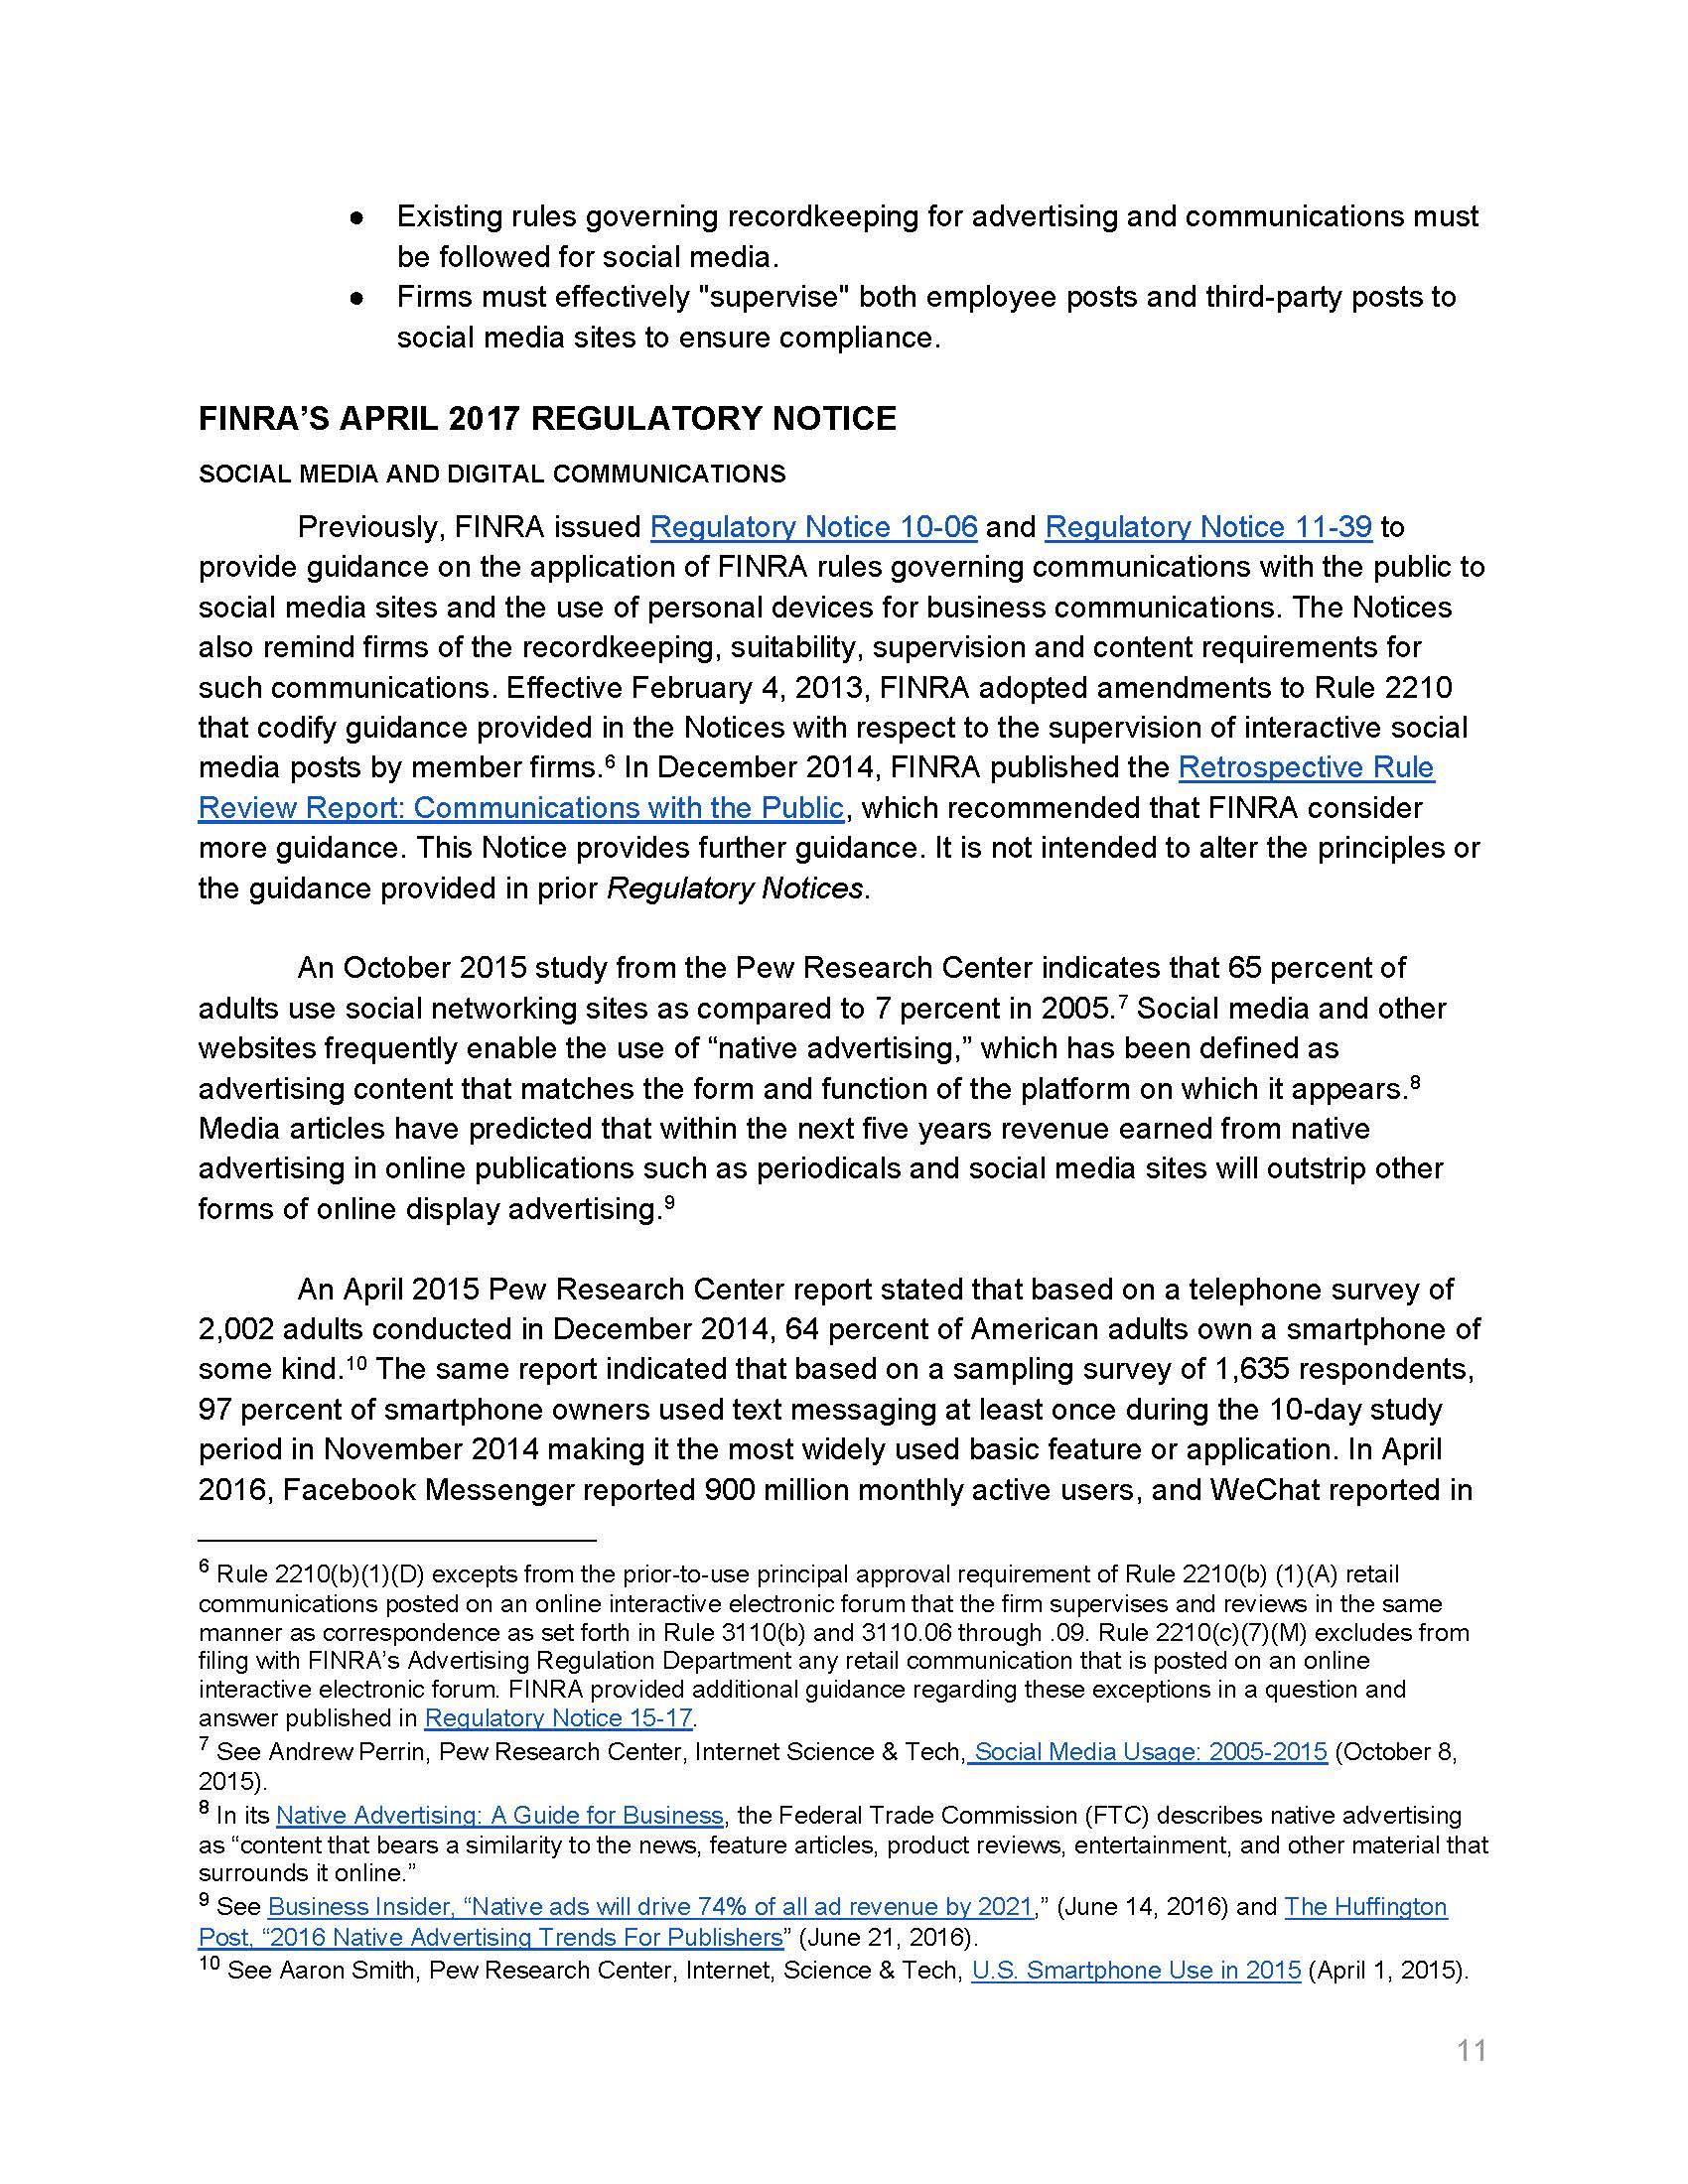 Amity Financial - Social Media White Paper_Page_12.jpg